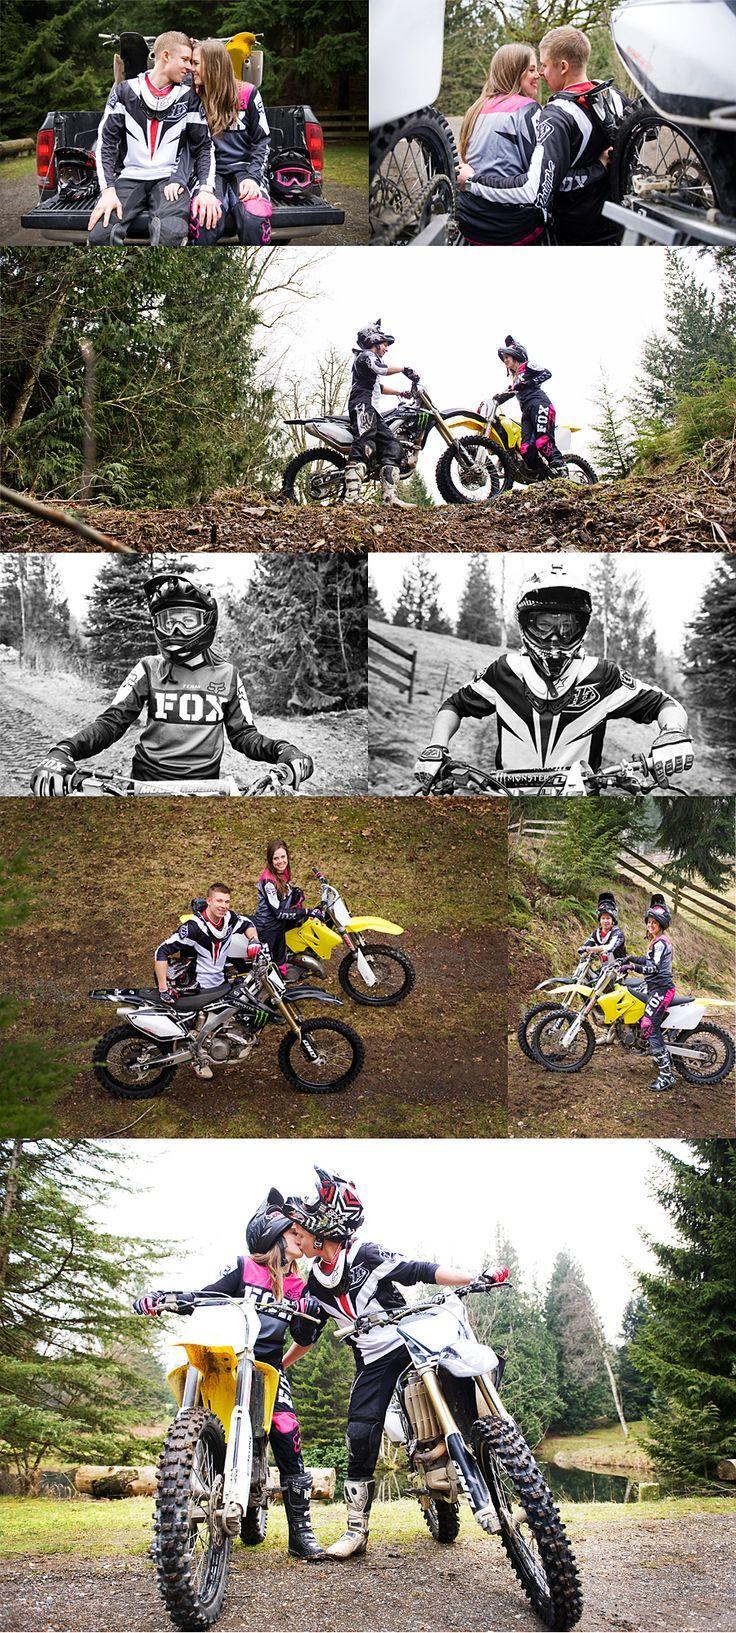 Dirt bike engagement